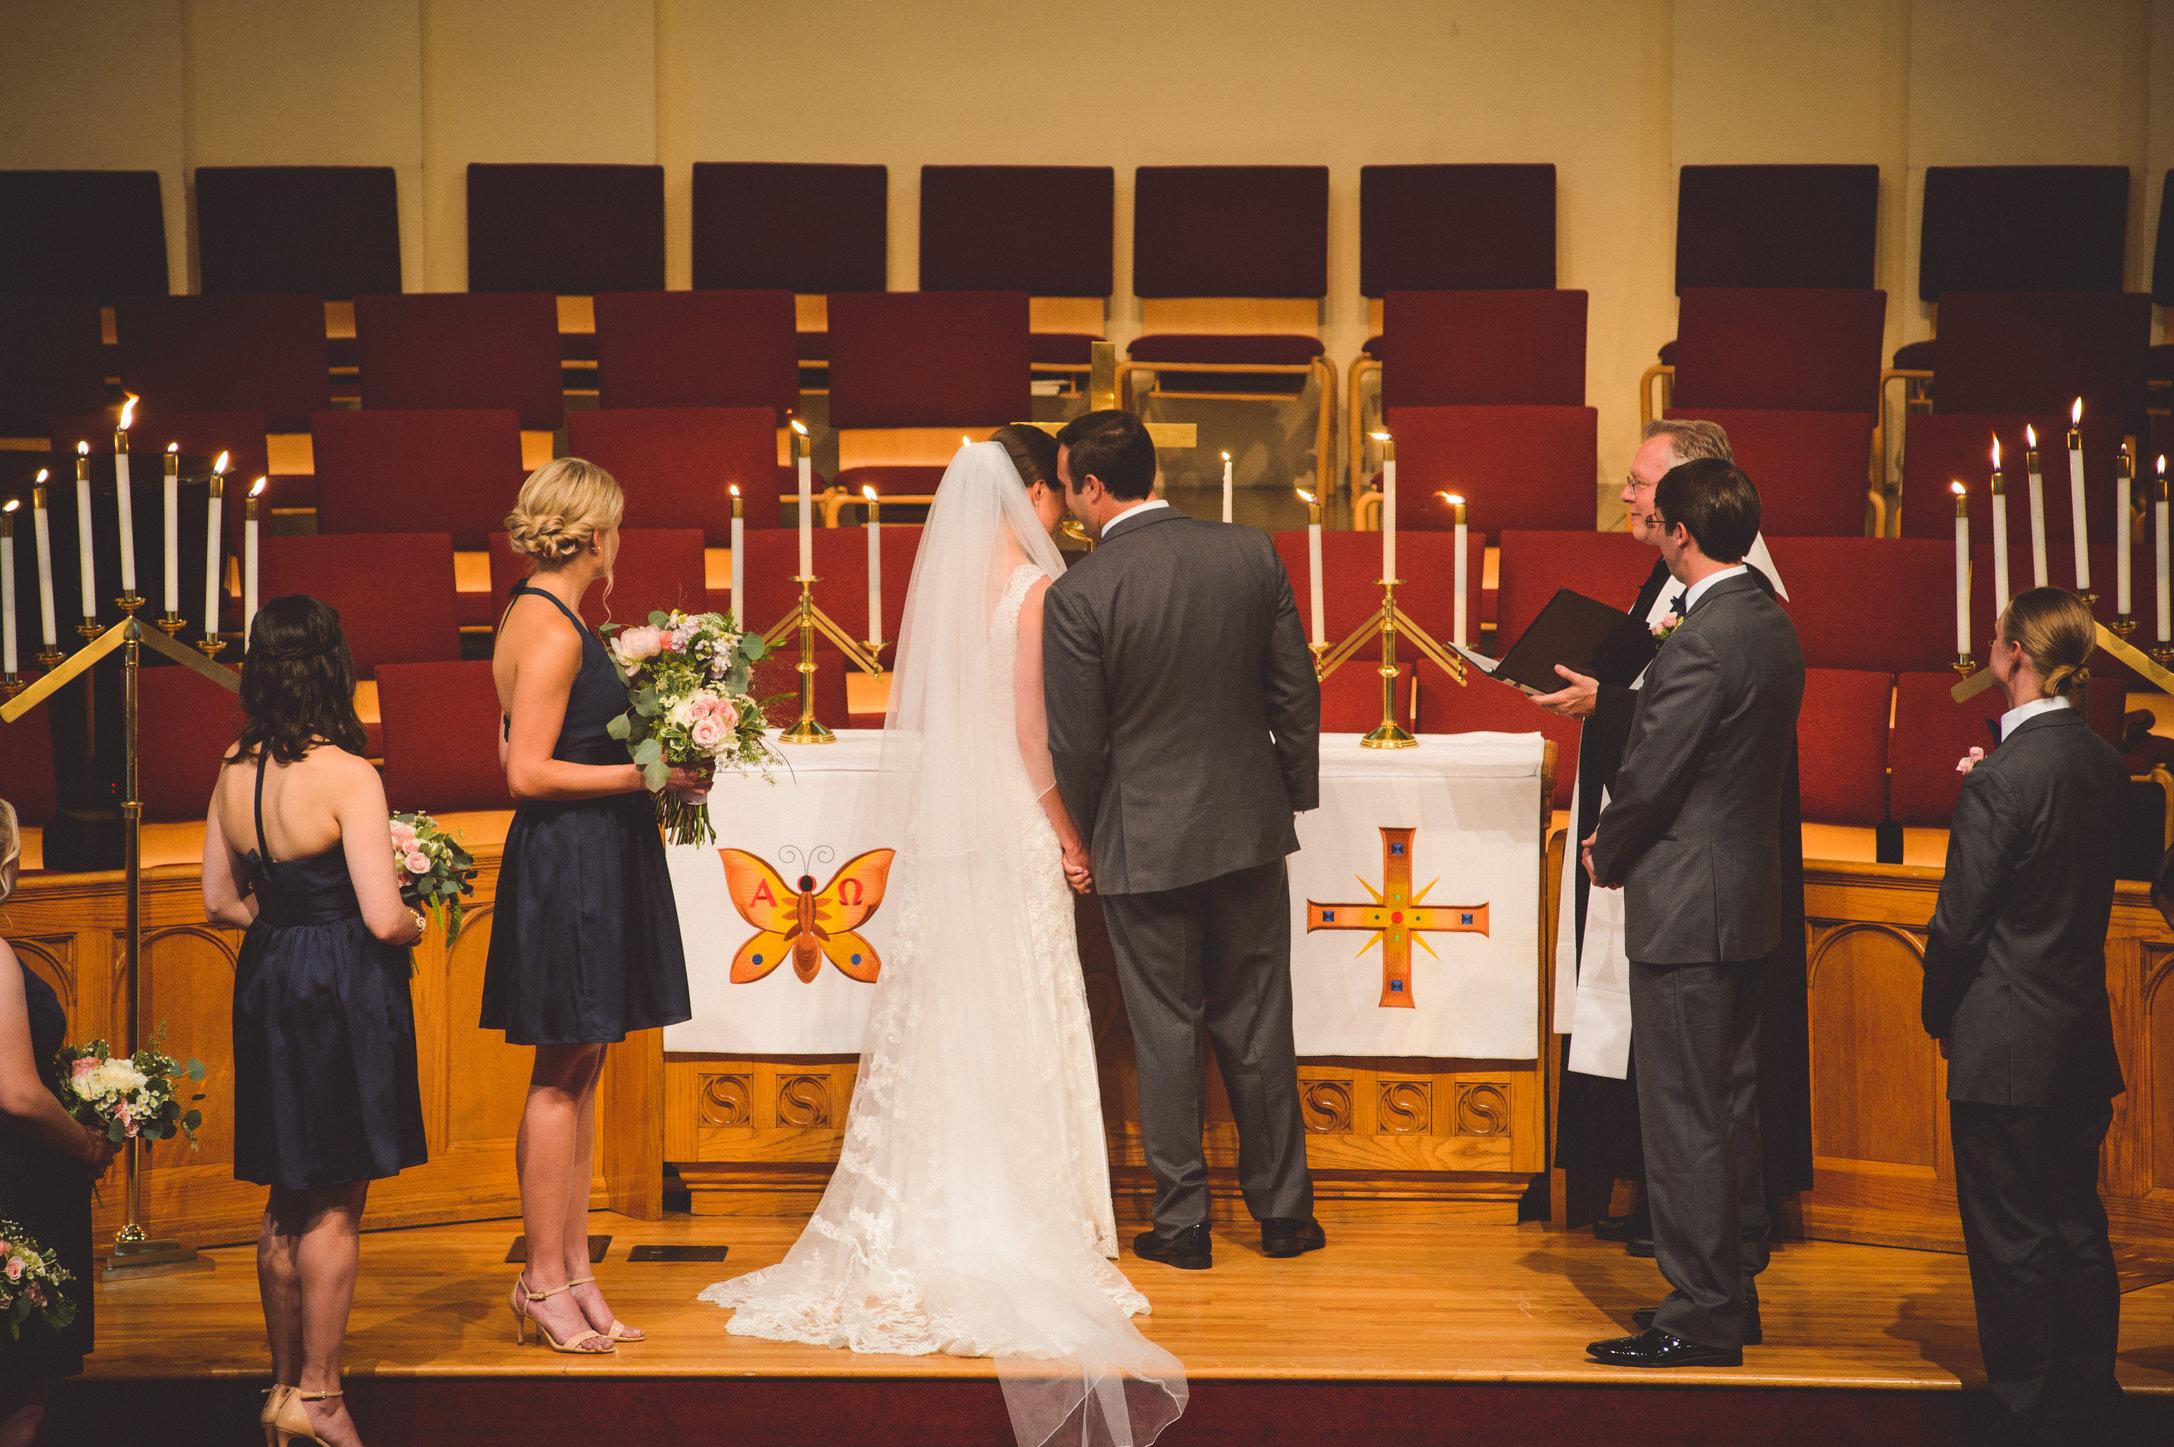 SandC-wedding-184.jpg